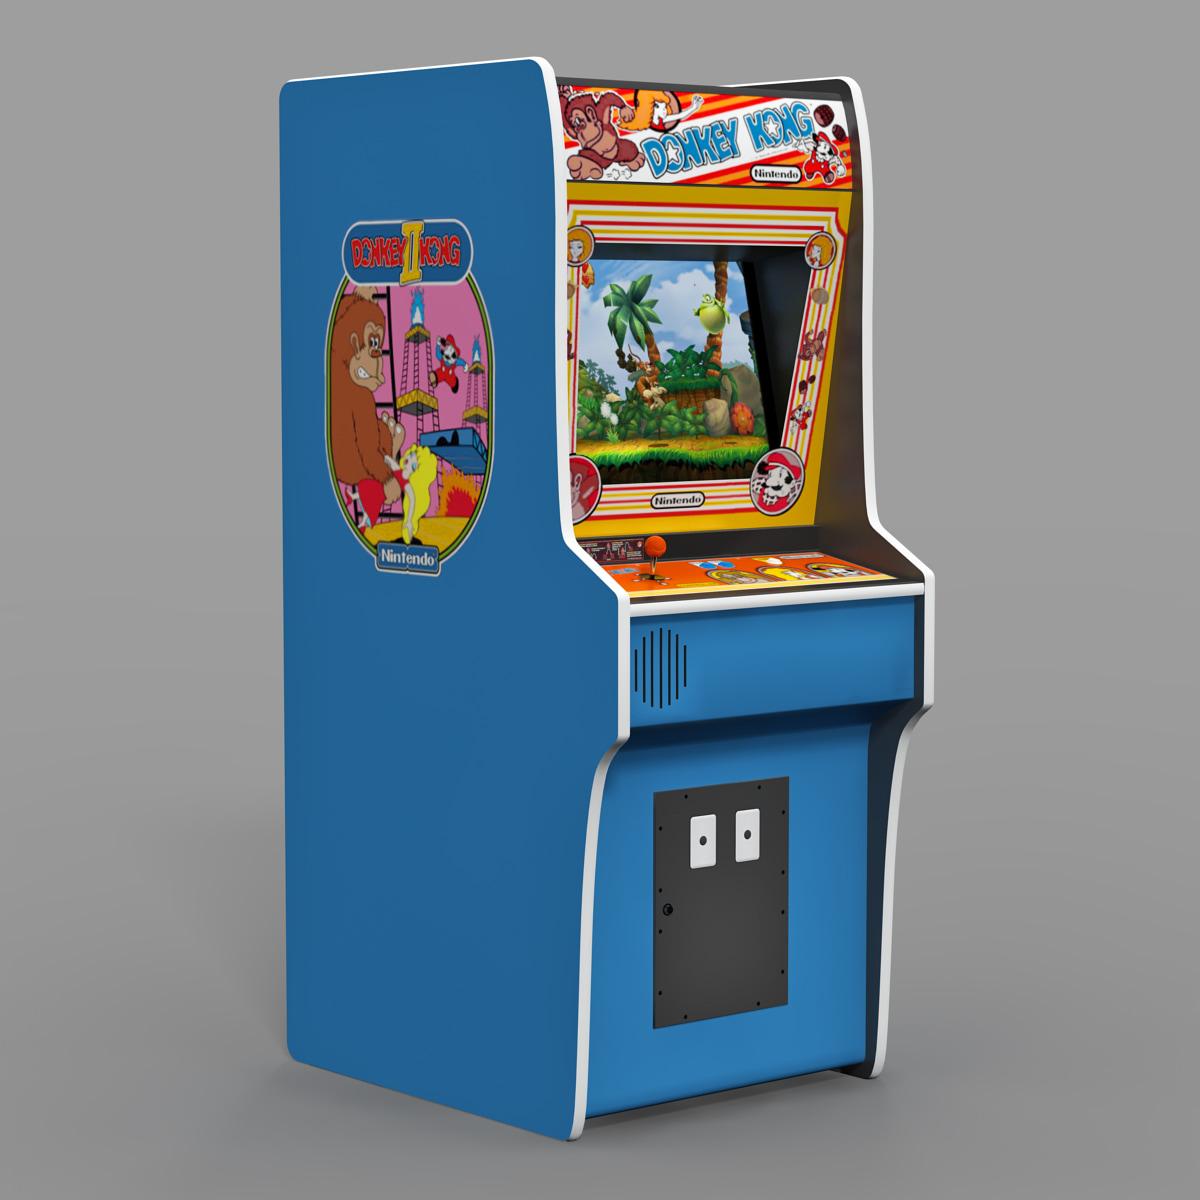 Arcade_Game_Donkey_Kong_01.jpg